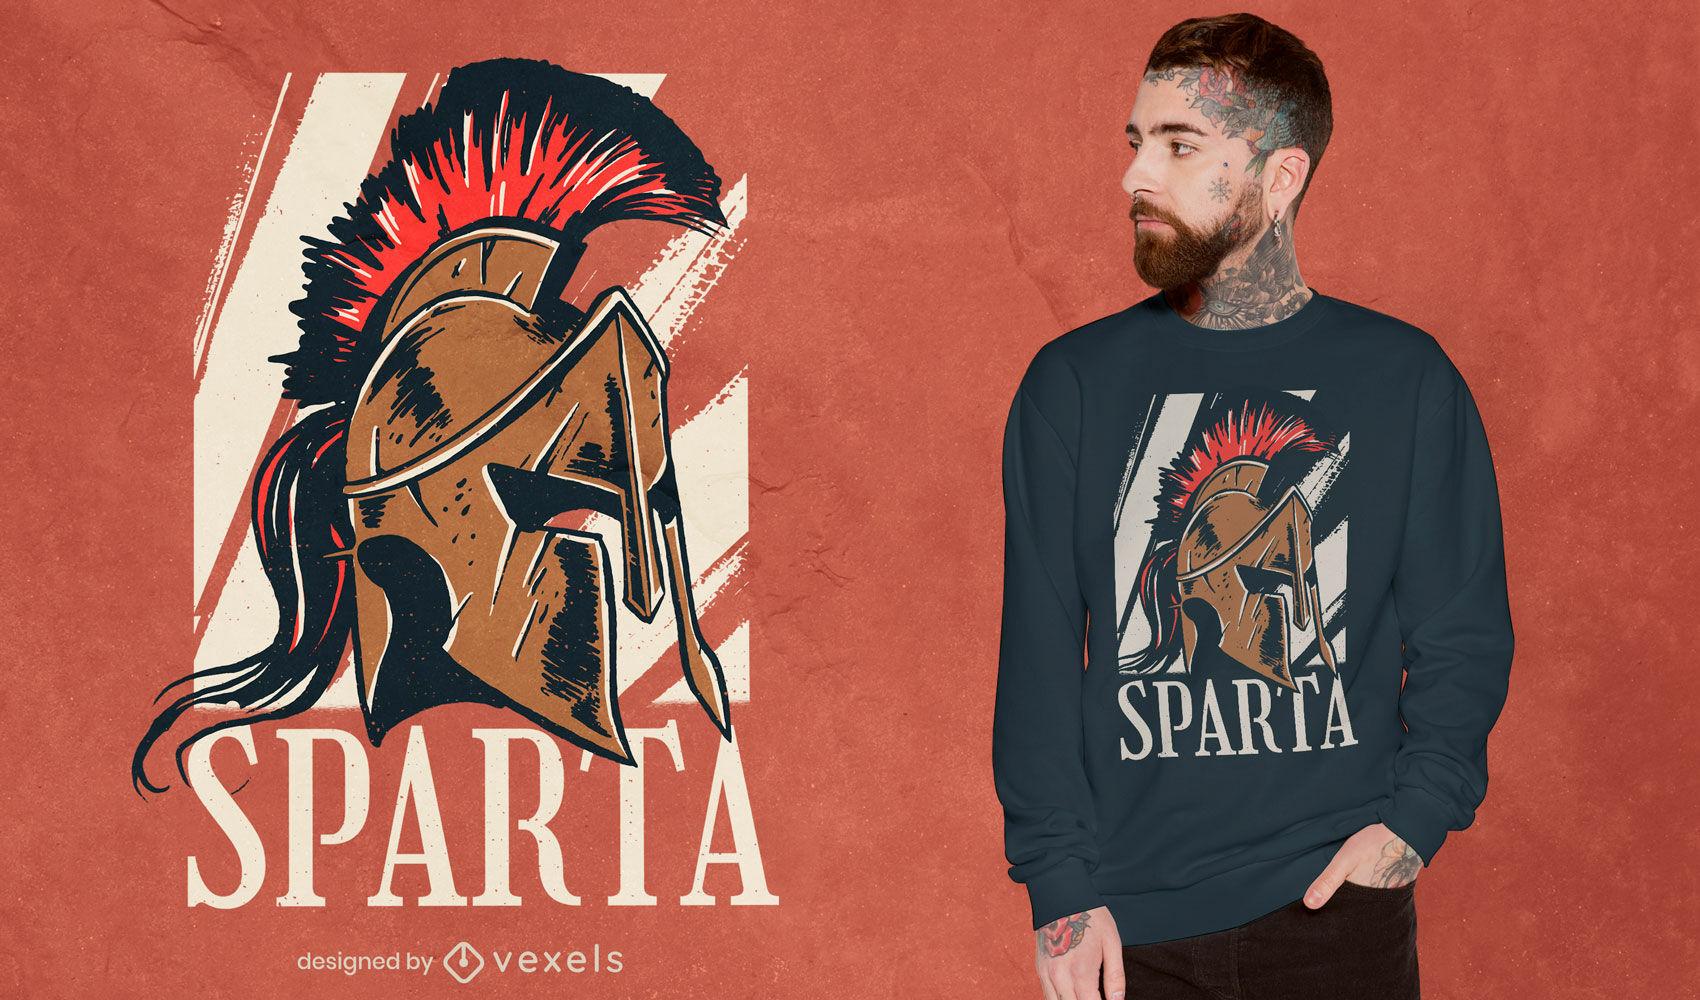 Diseño de camiseta histórica de casco espartano.